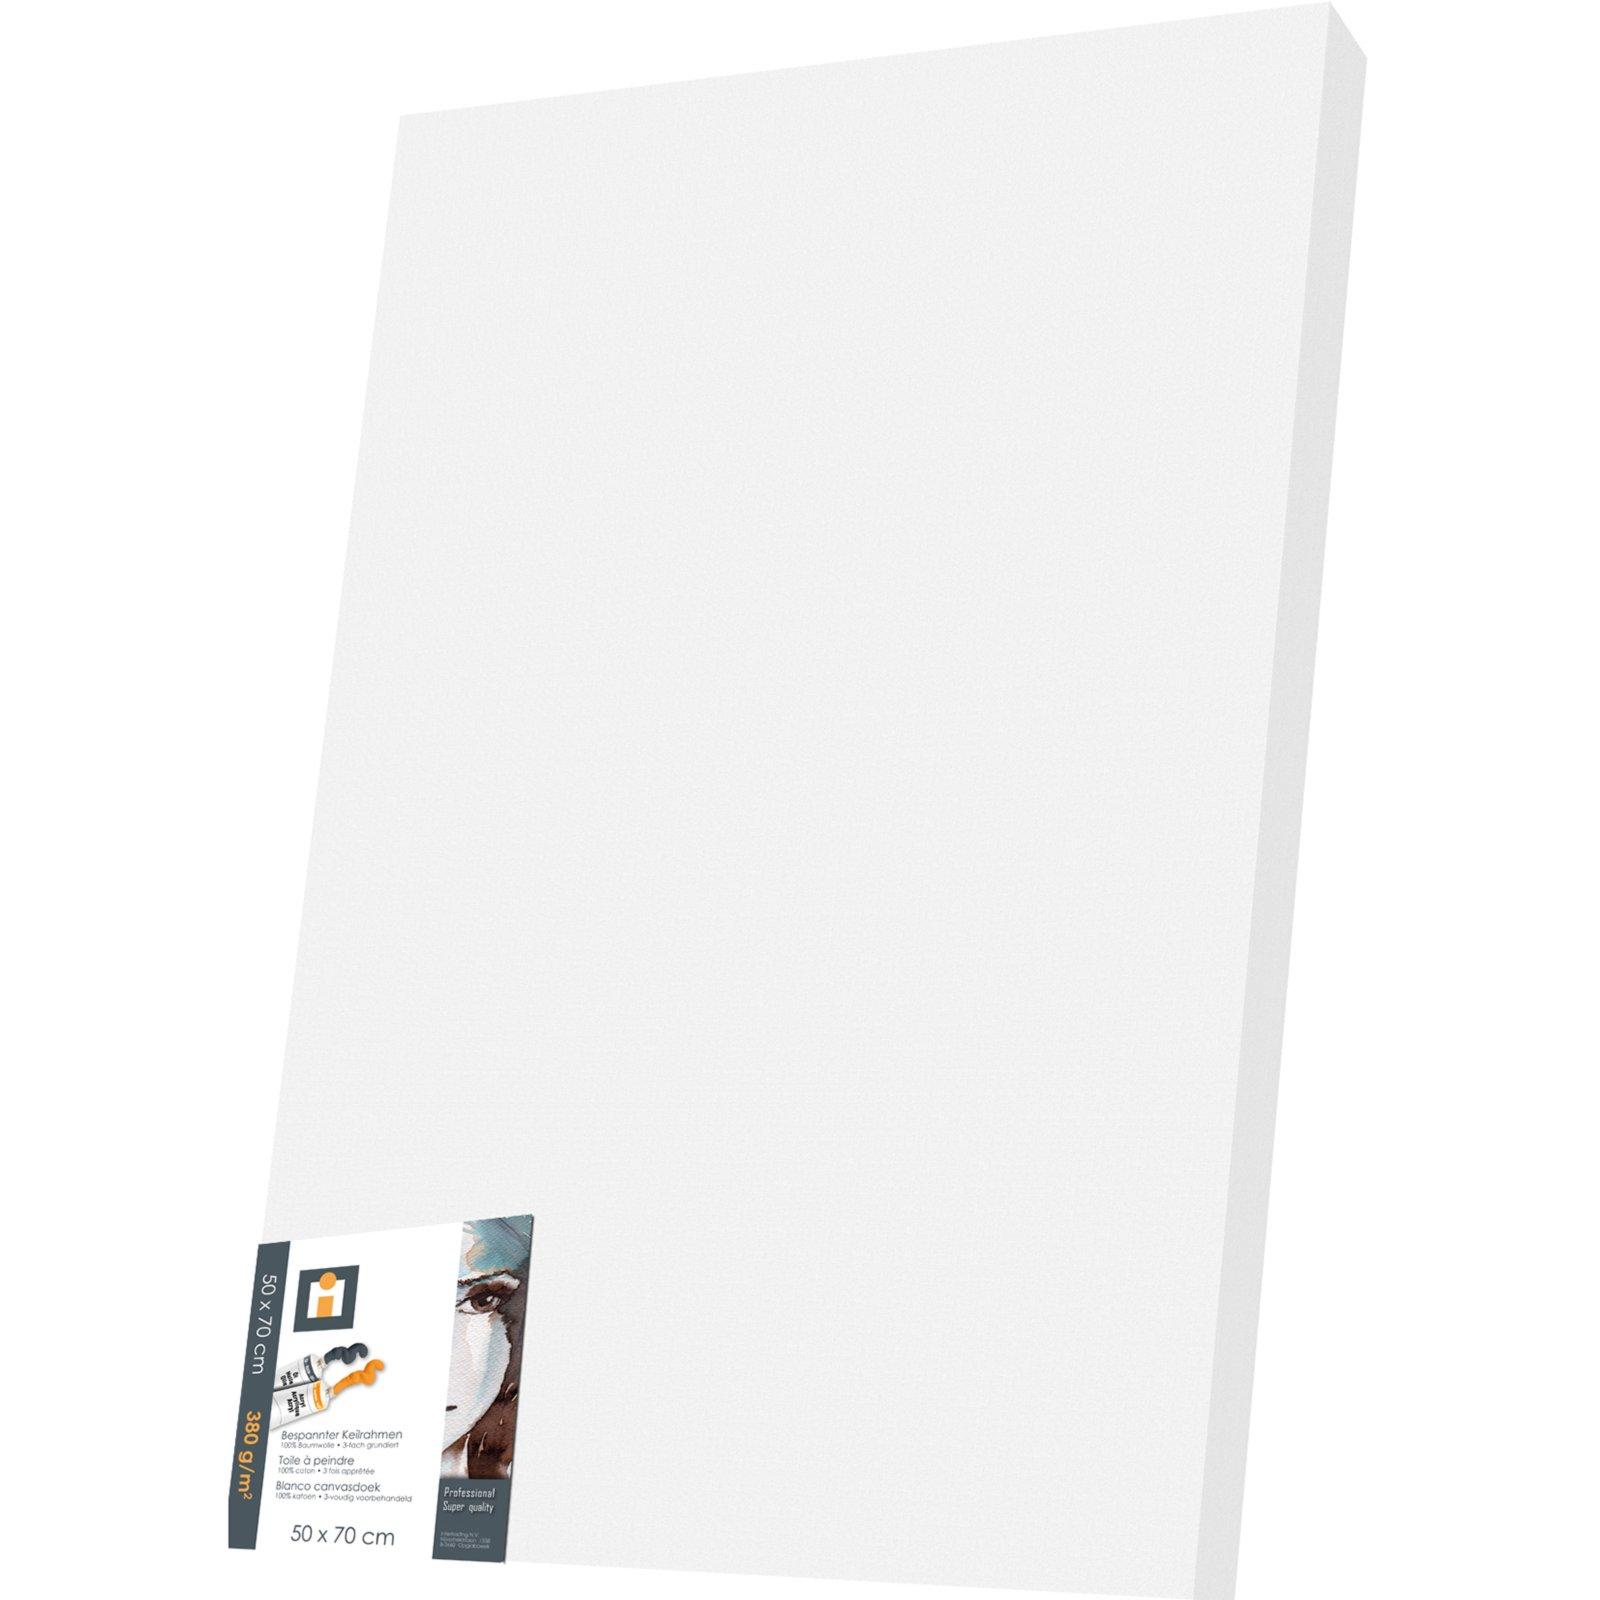 Künstler-Leinwand CANVAS - 50x70 cm